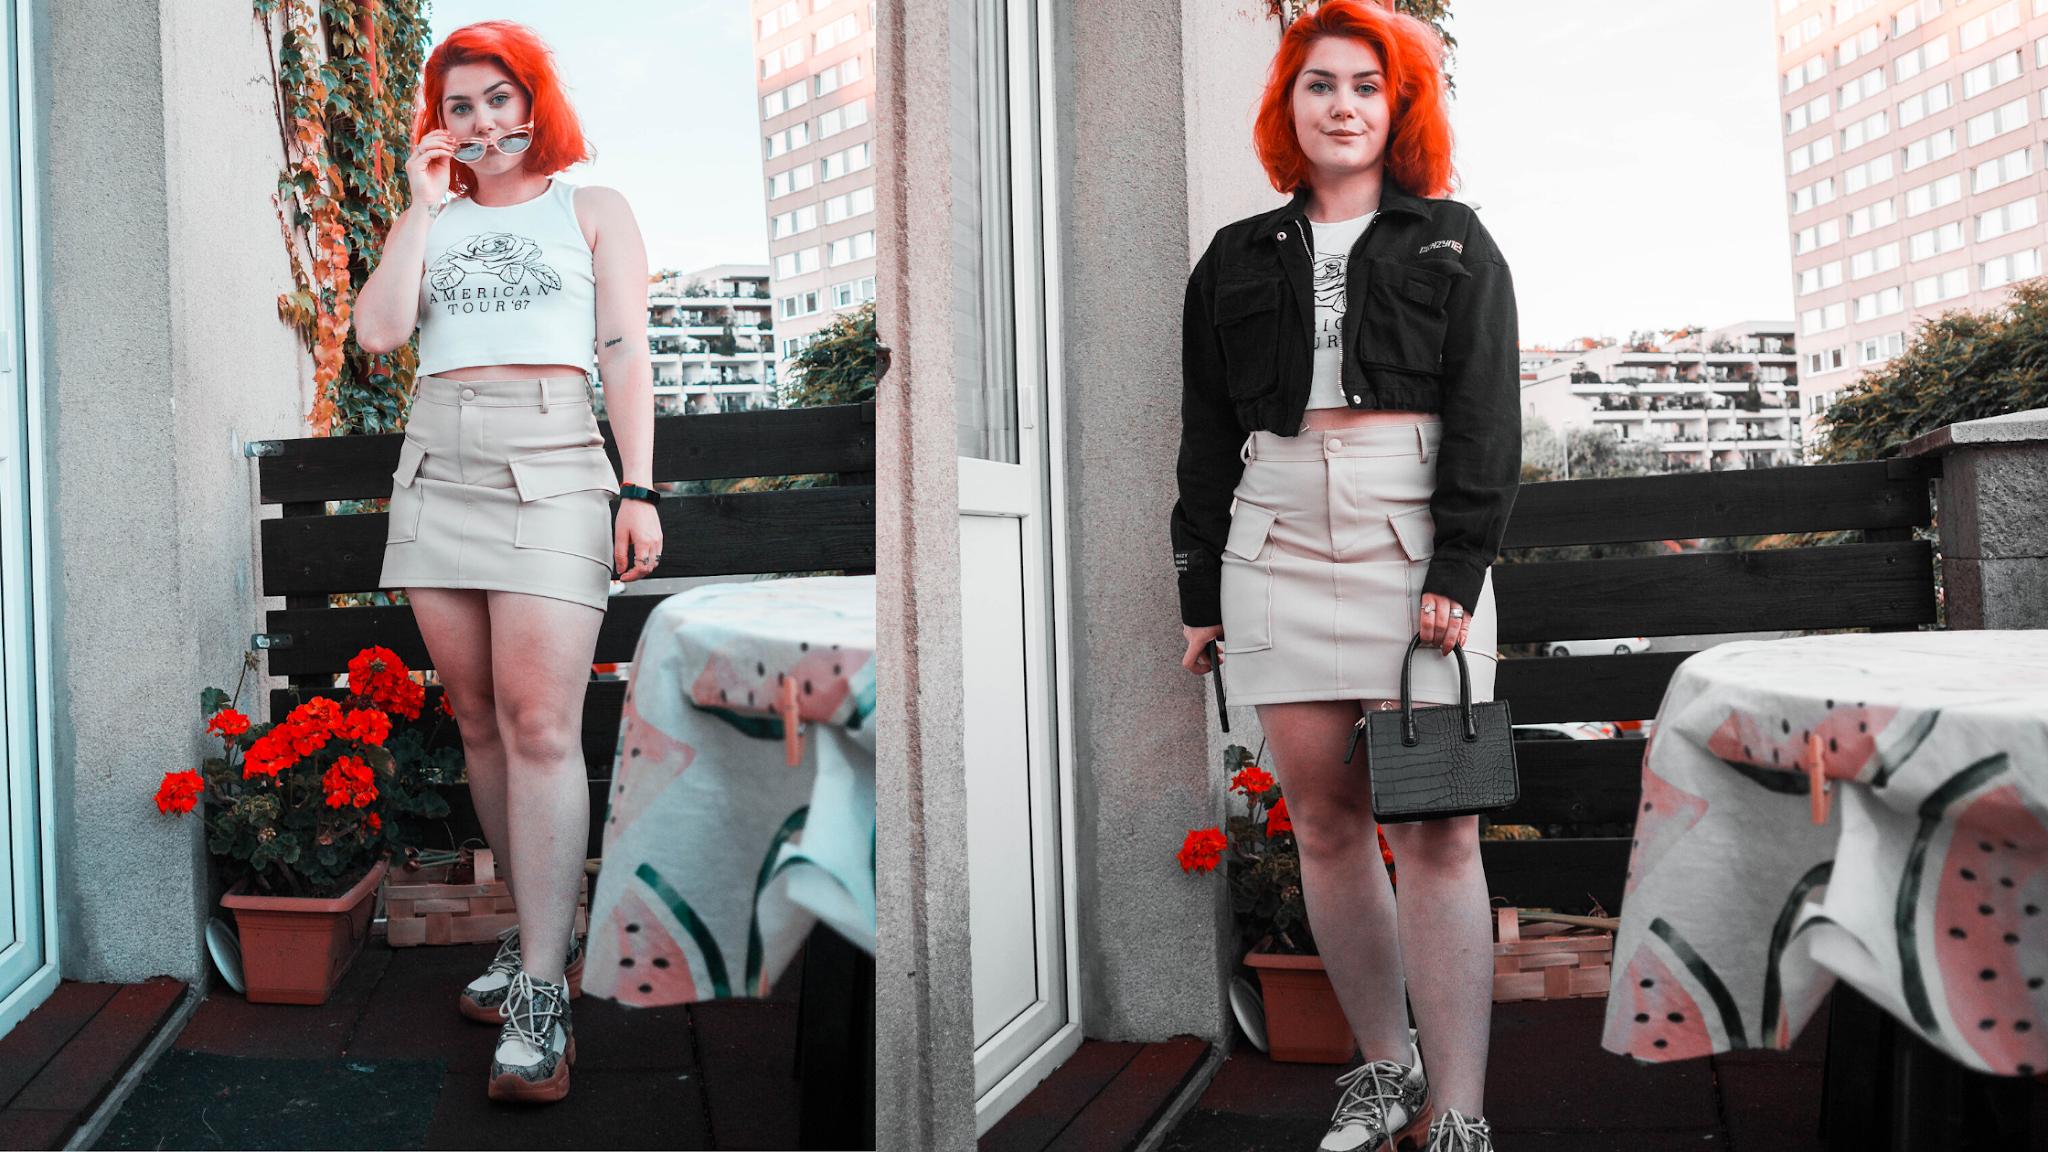 Béžová koženková sukně Sinsay a bílý croptop a černá crop bunda